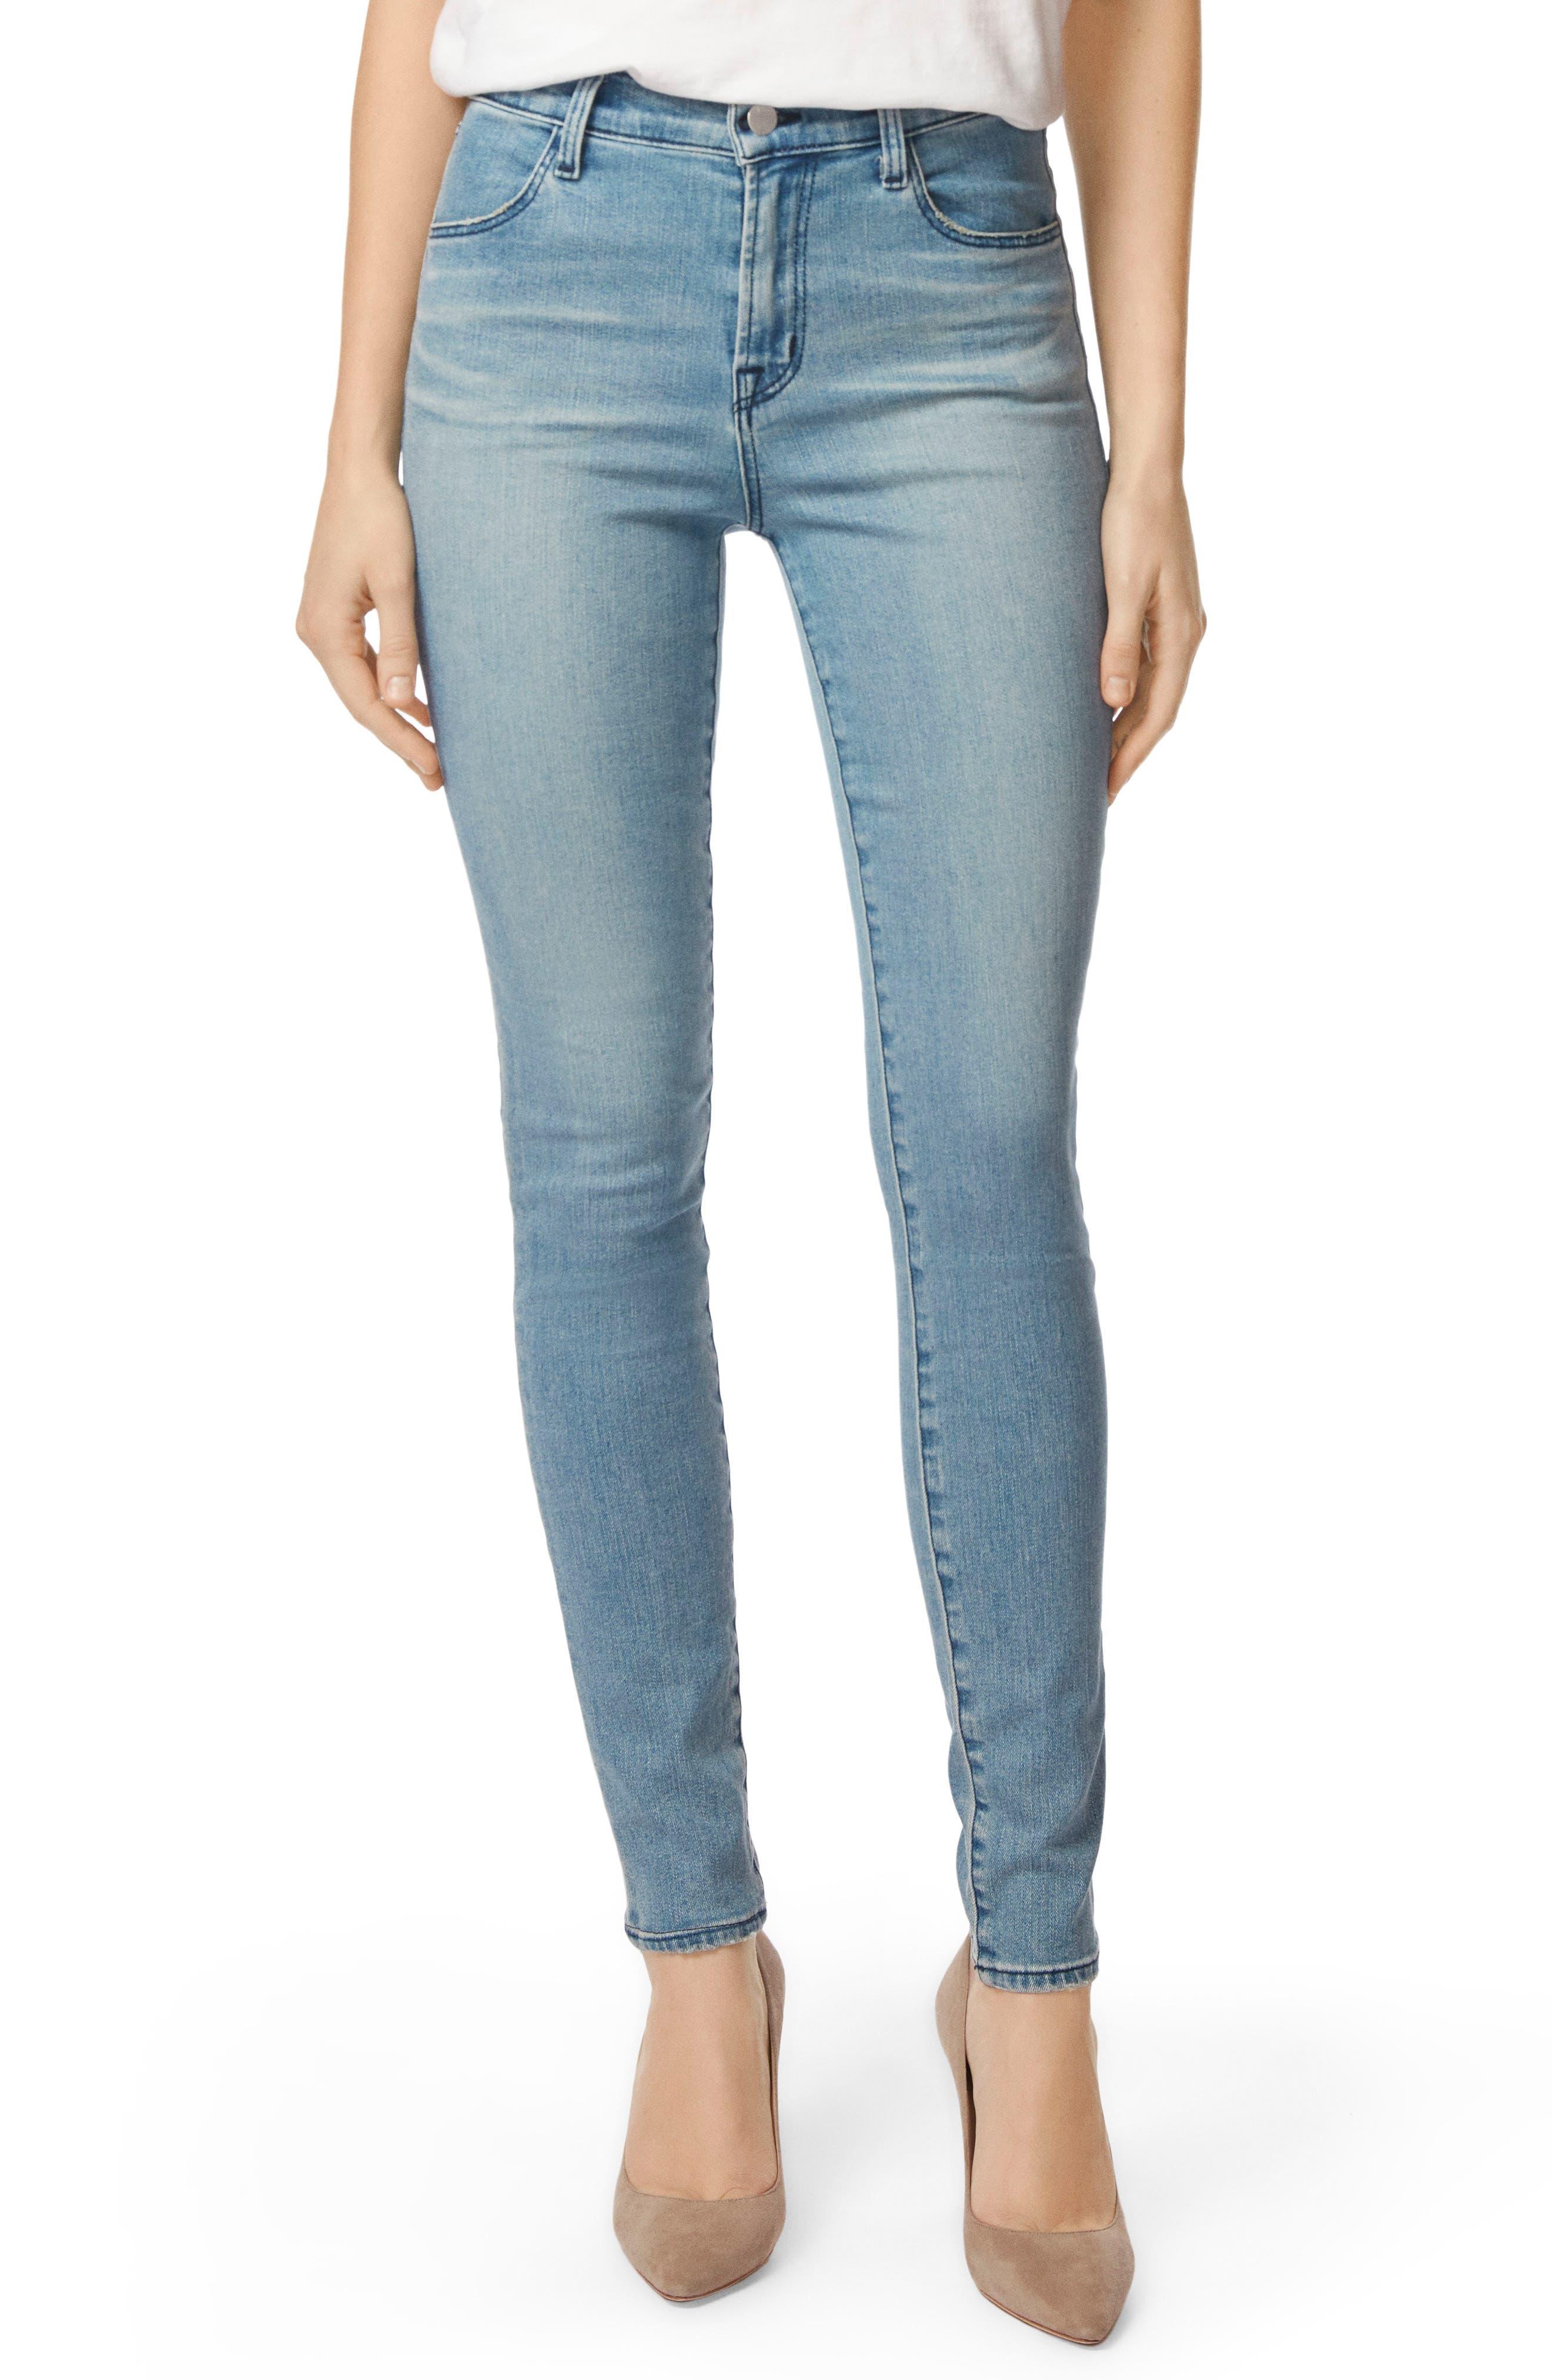 J BRAND Maria High Waist Skinny Jeans, Main, color, 407